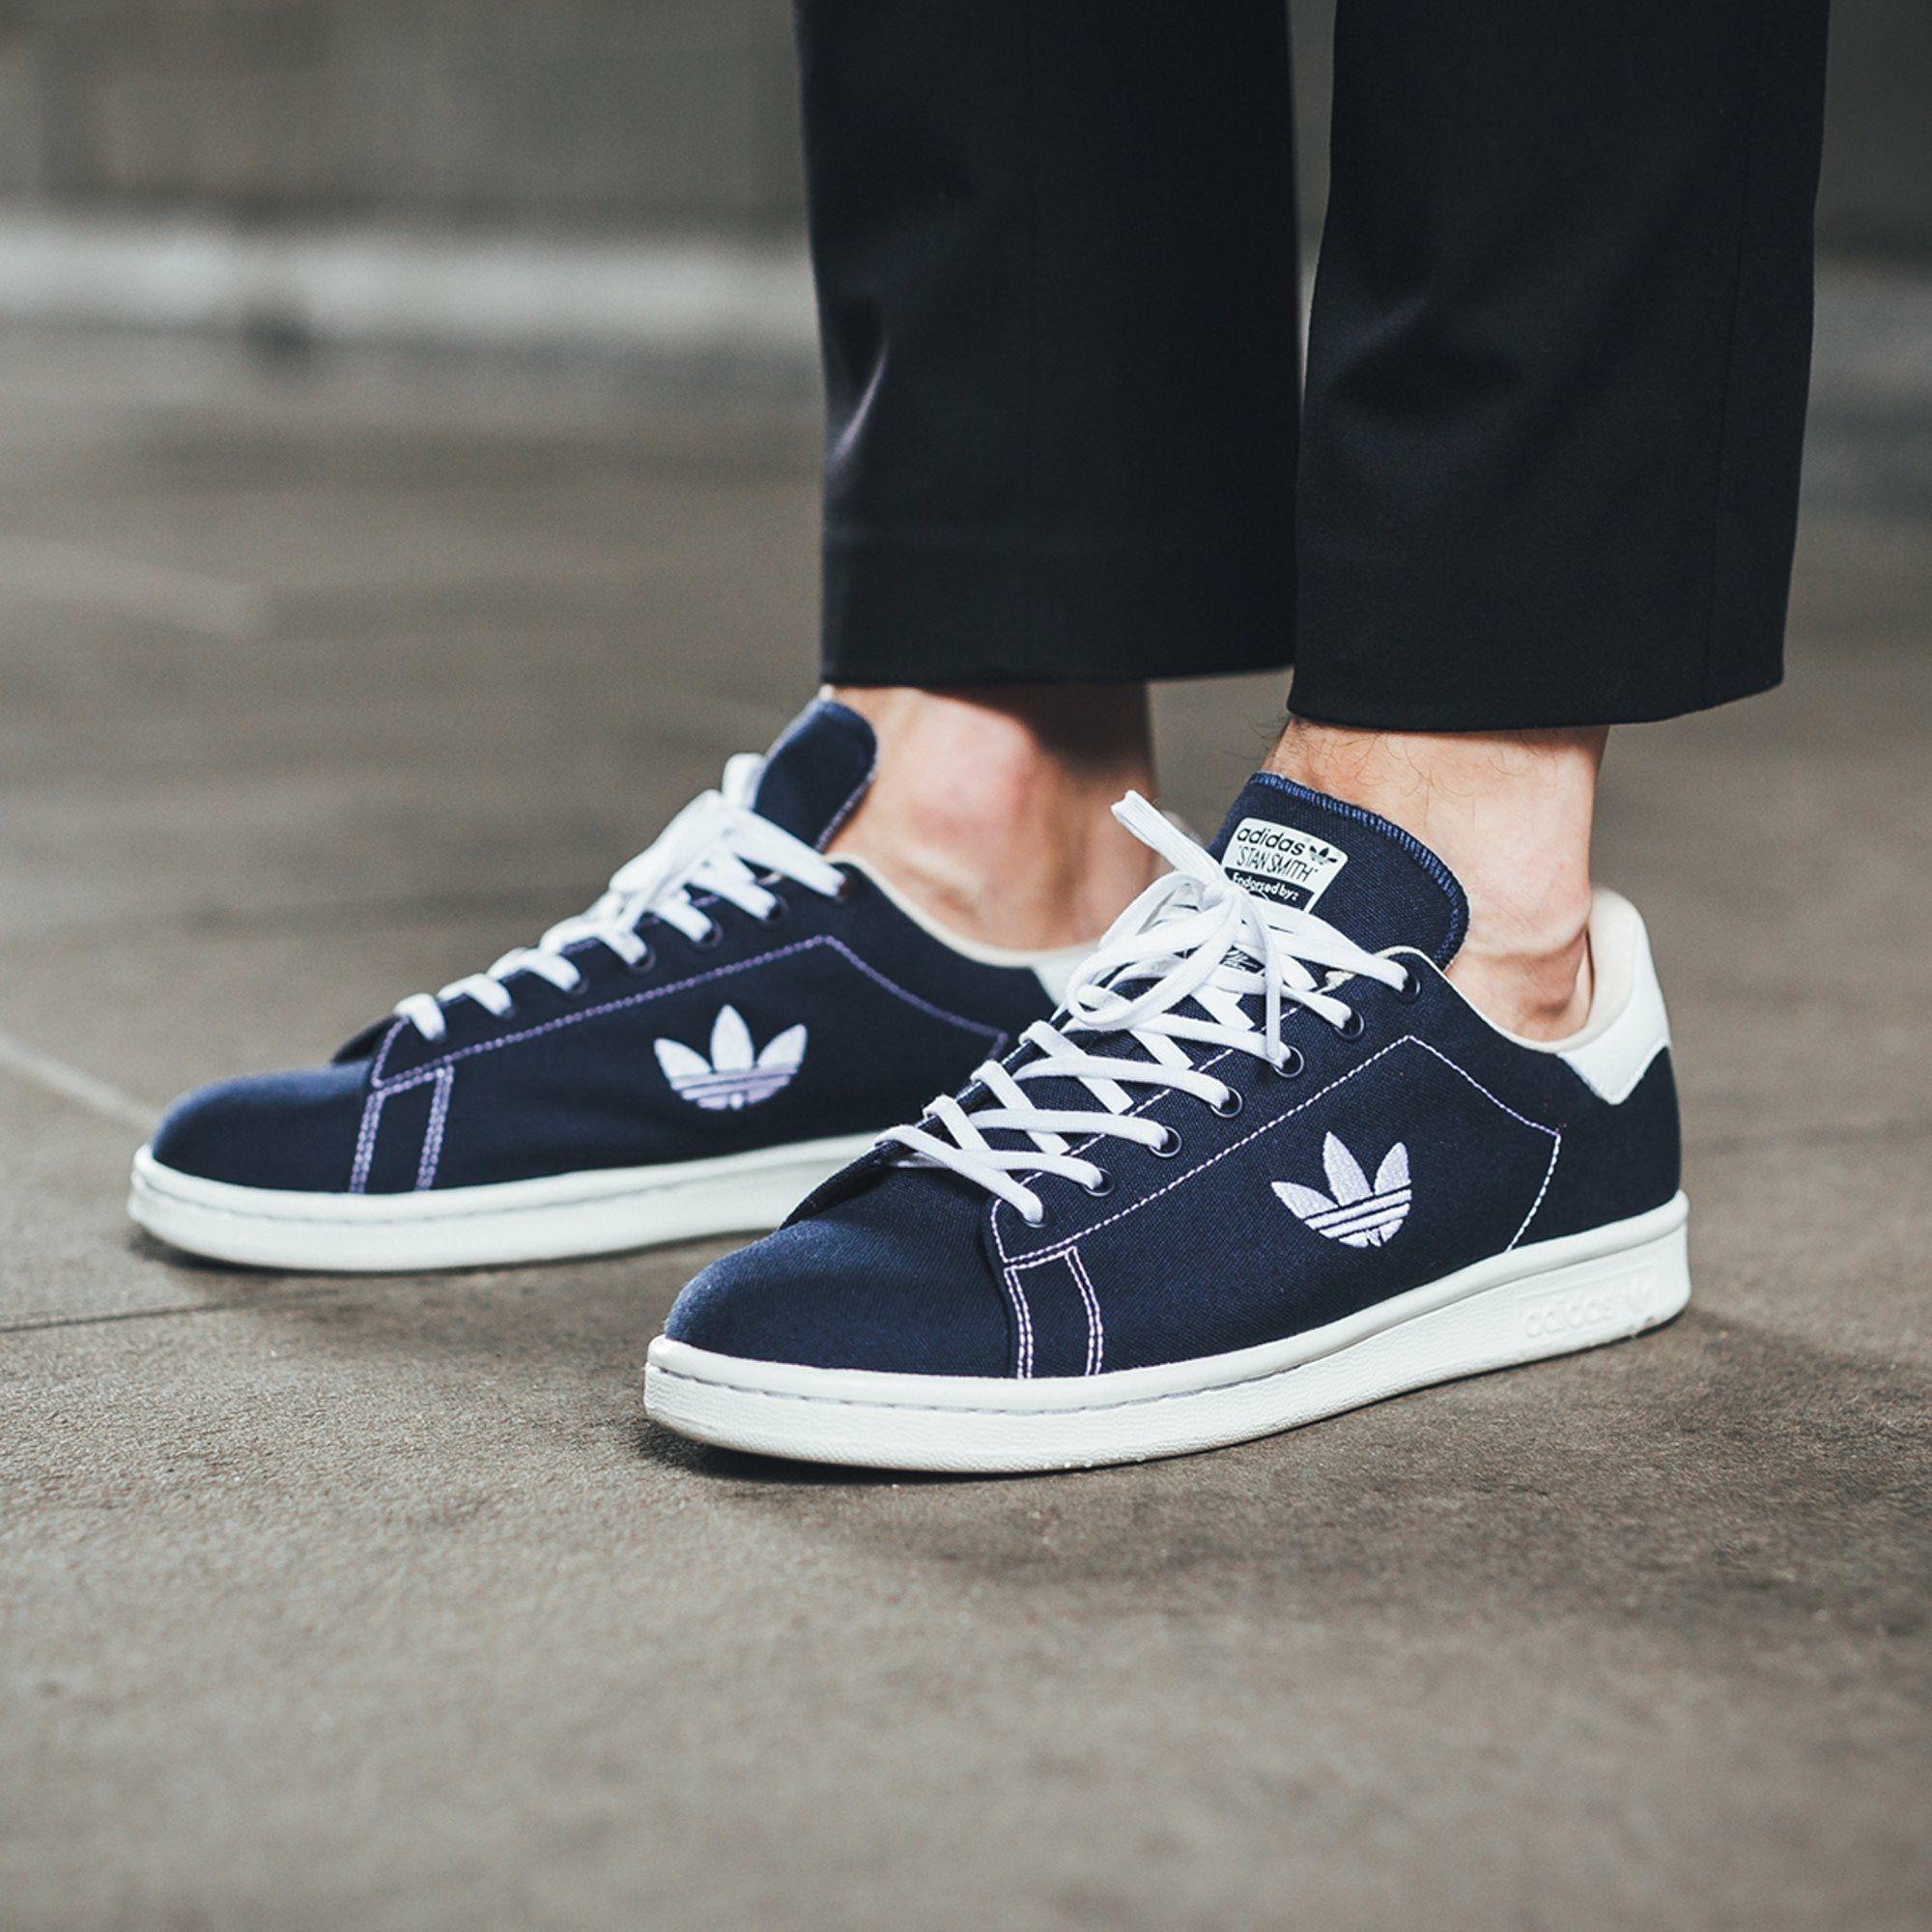 adidas Originals Stan Smith | Adidas stan smith, Adidas